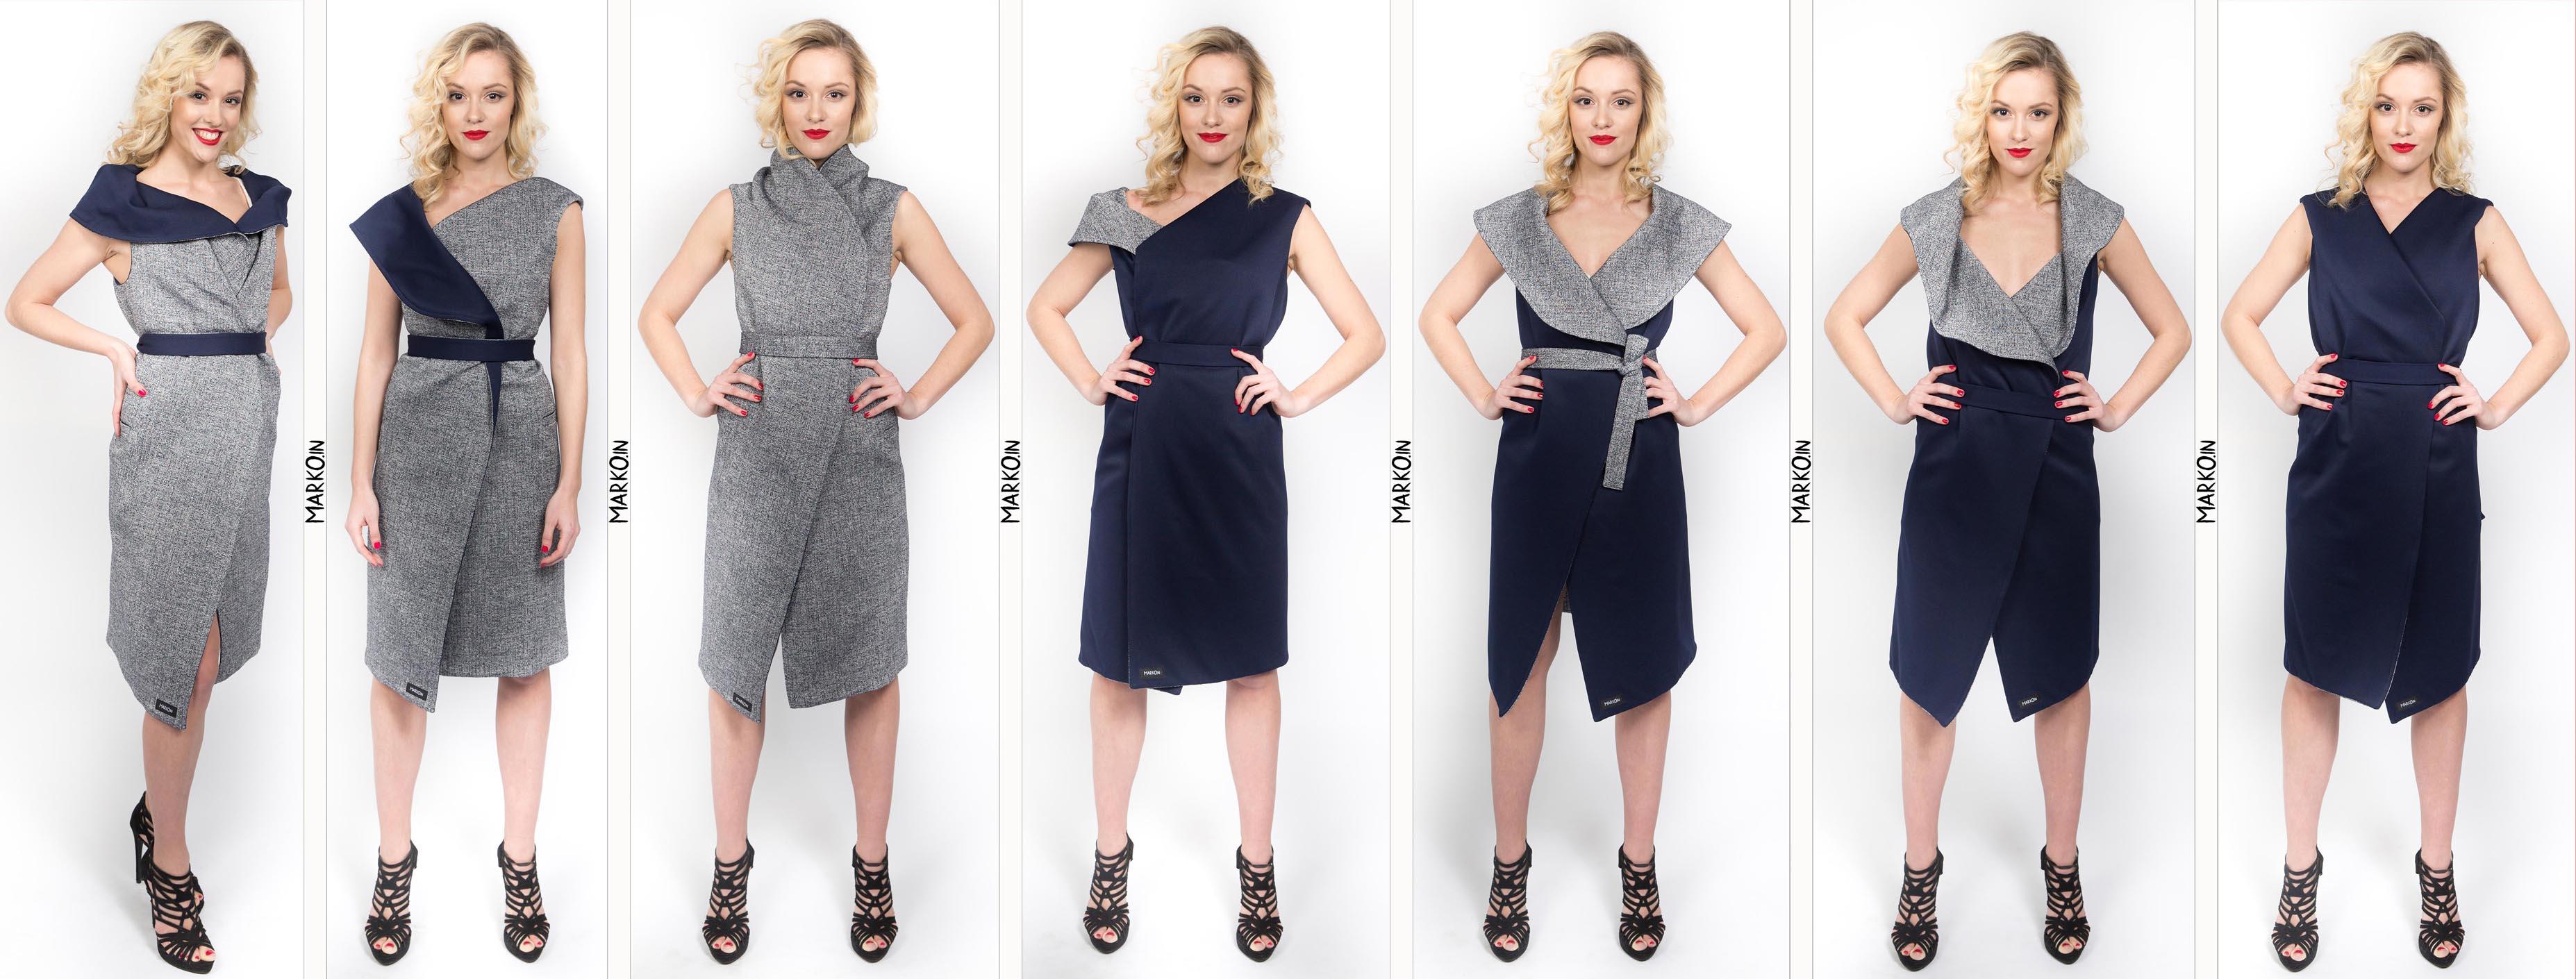 Markoin_photostory_dress_Emilie